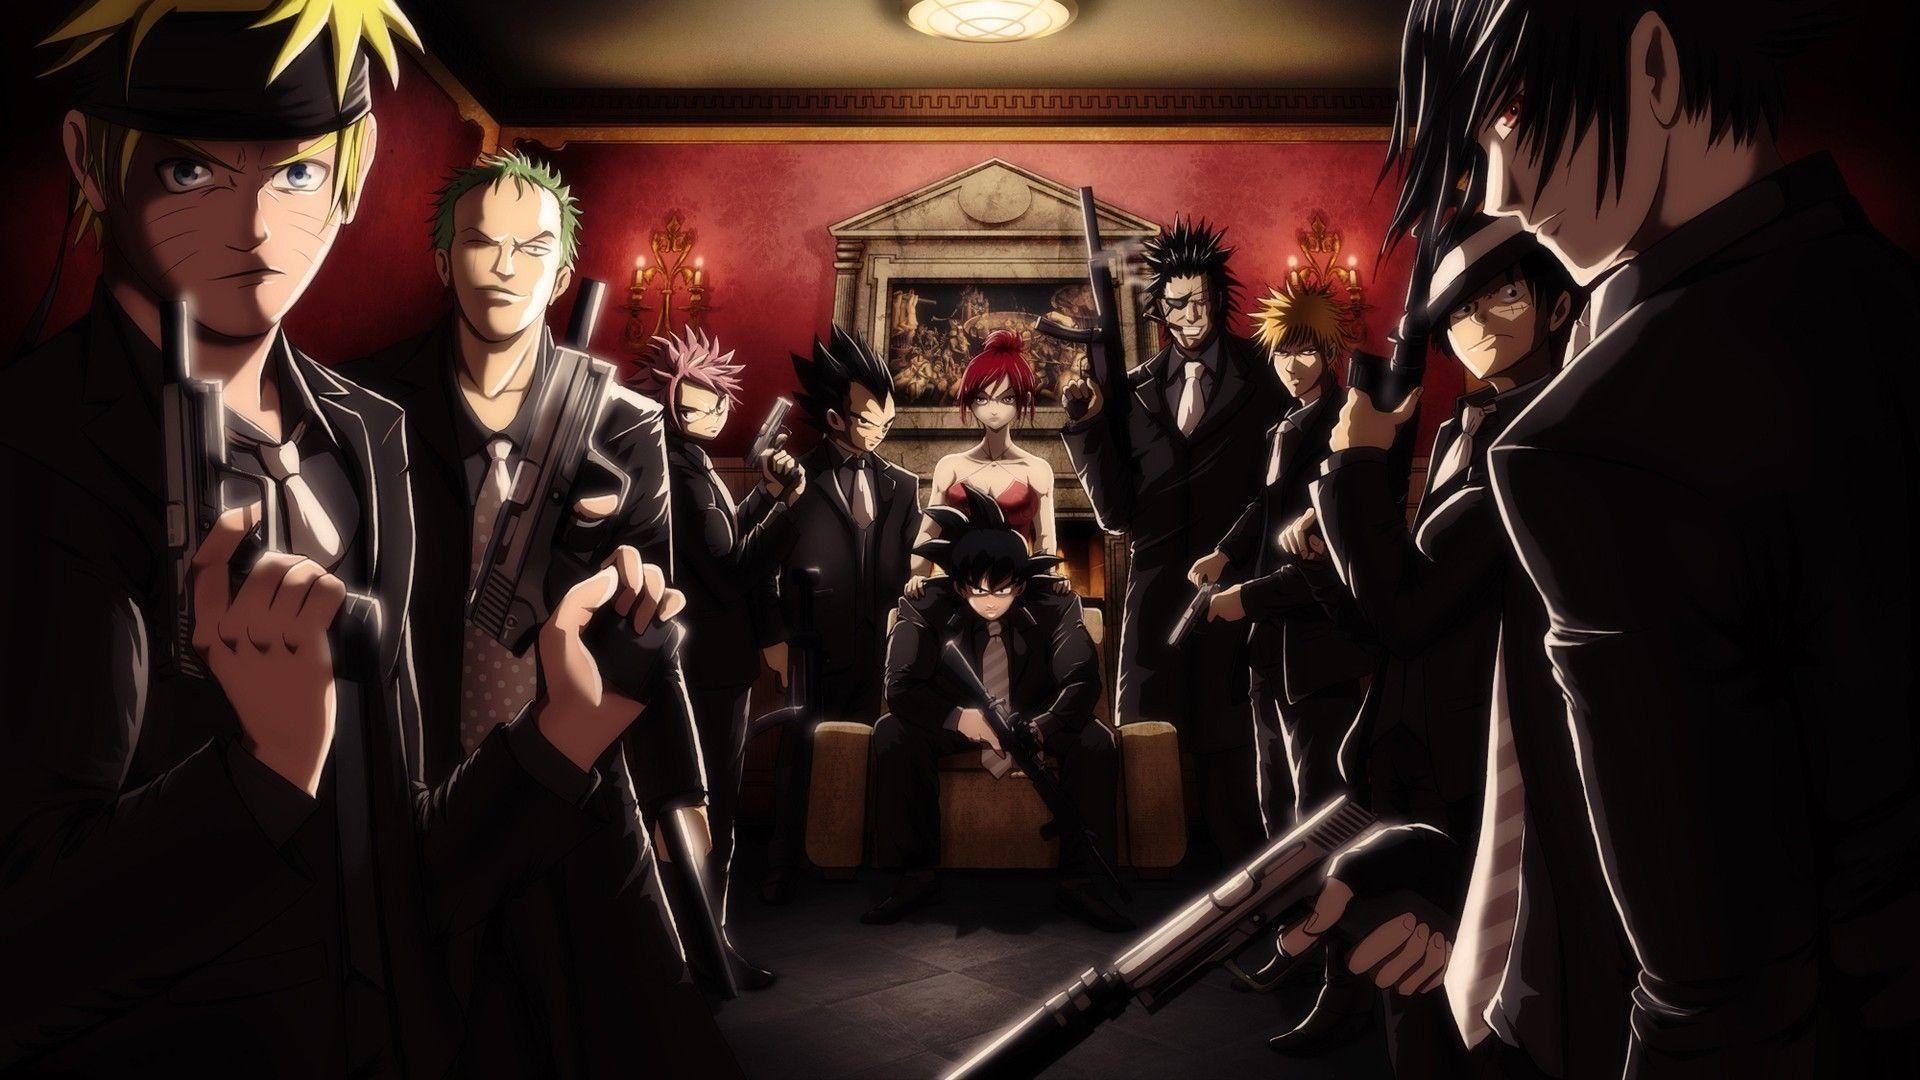 Anime Mafia Wallpapers Top Free Anime Mafia Backgrounds Wallpaperaccess